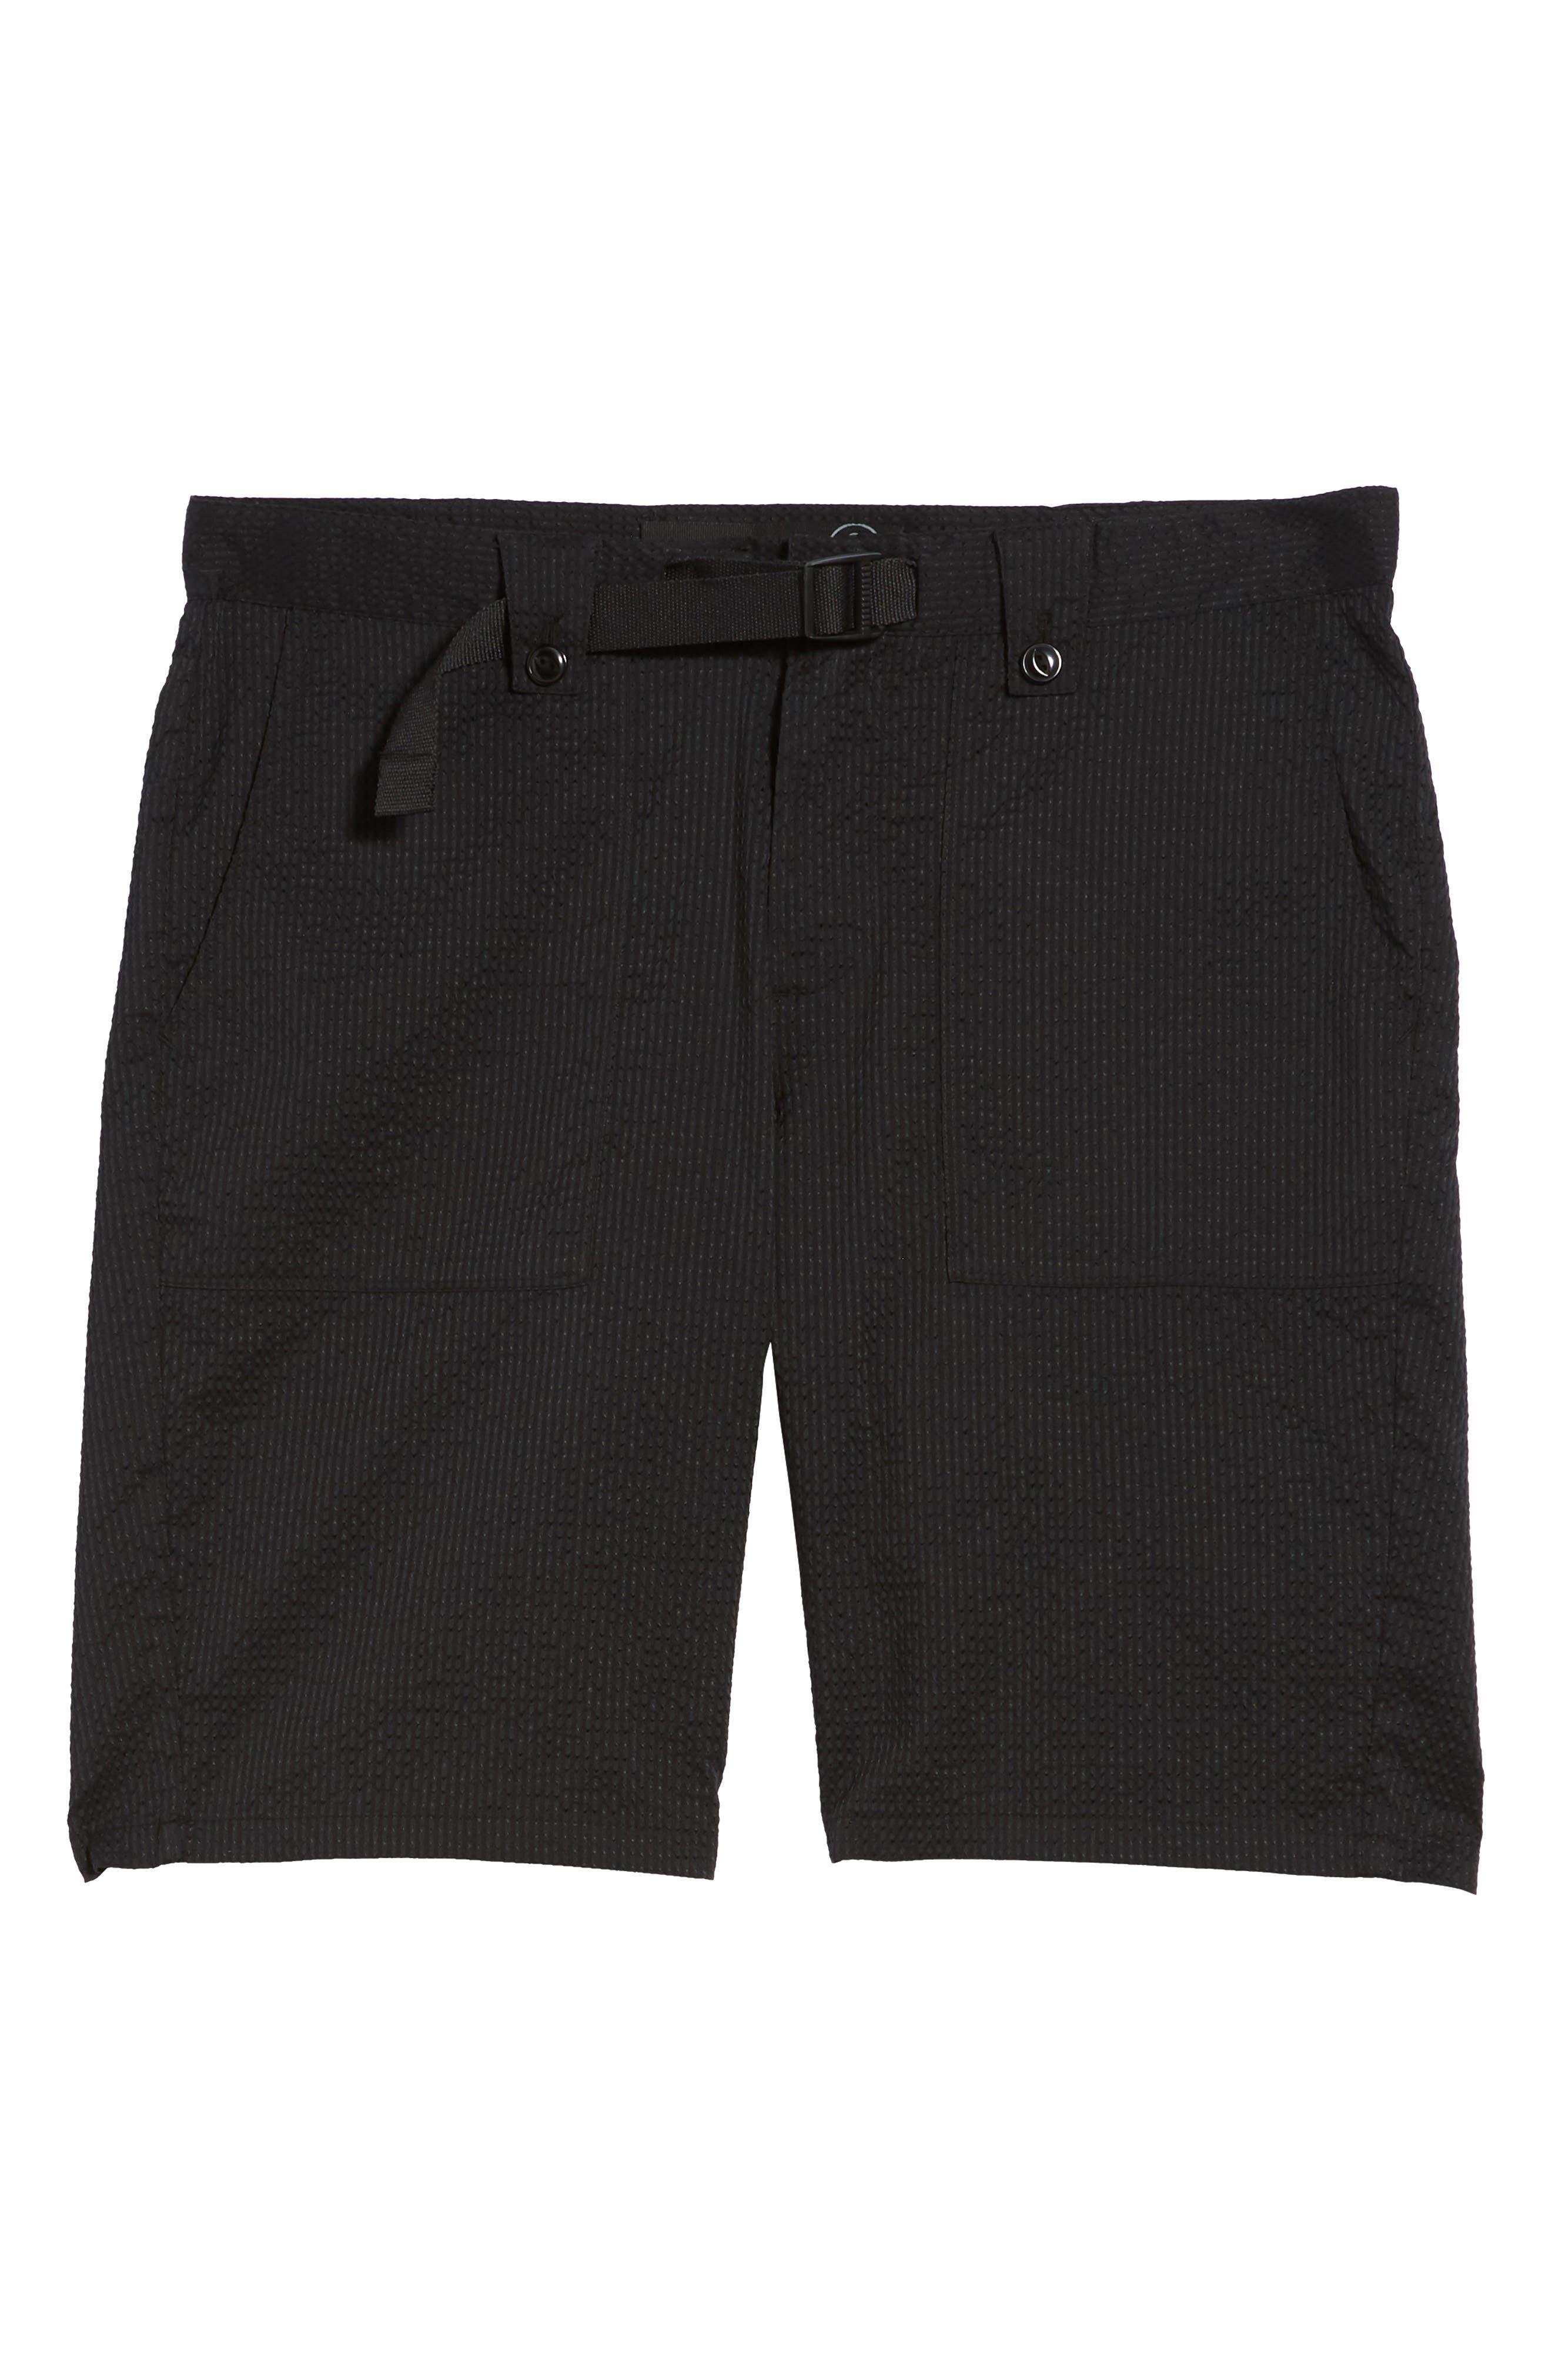 Utility Seersucker Shorts,                             Alternate thumbnail 6, color,                             Black Seersucker